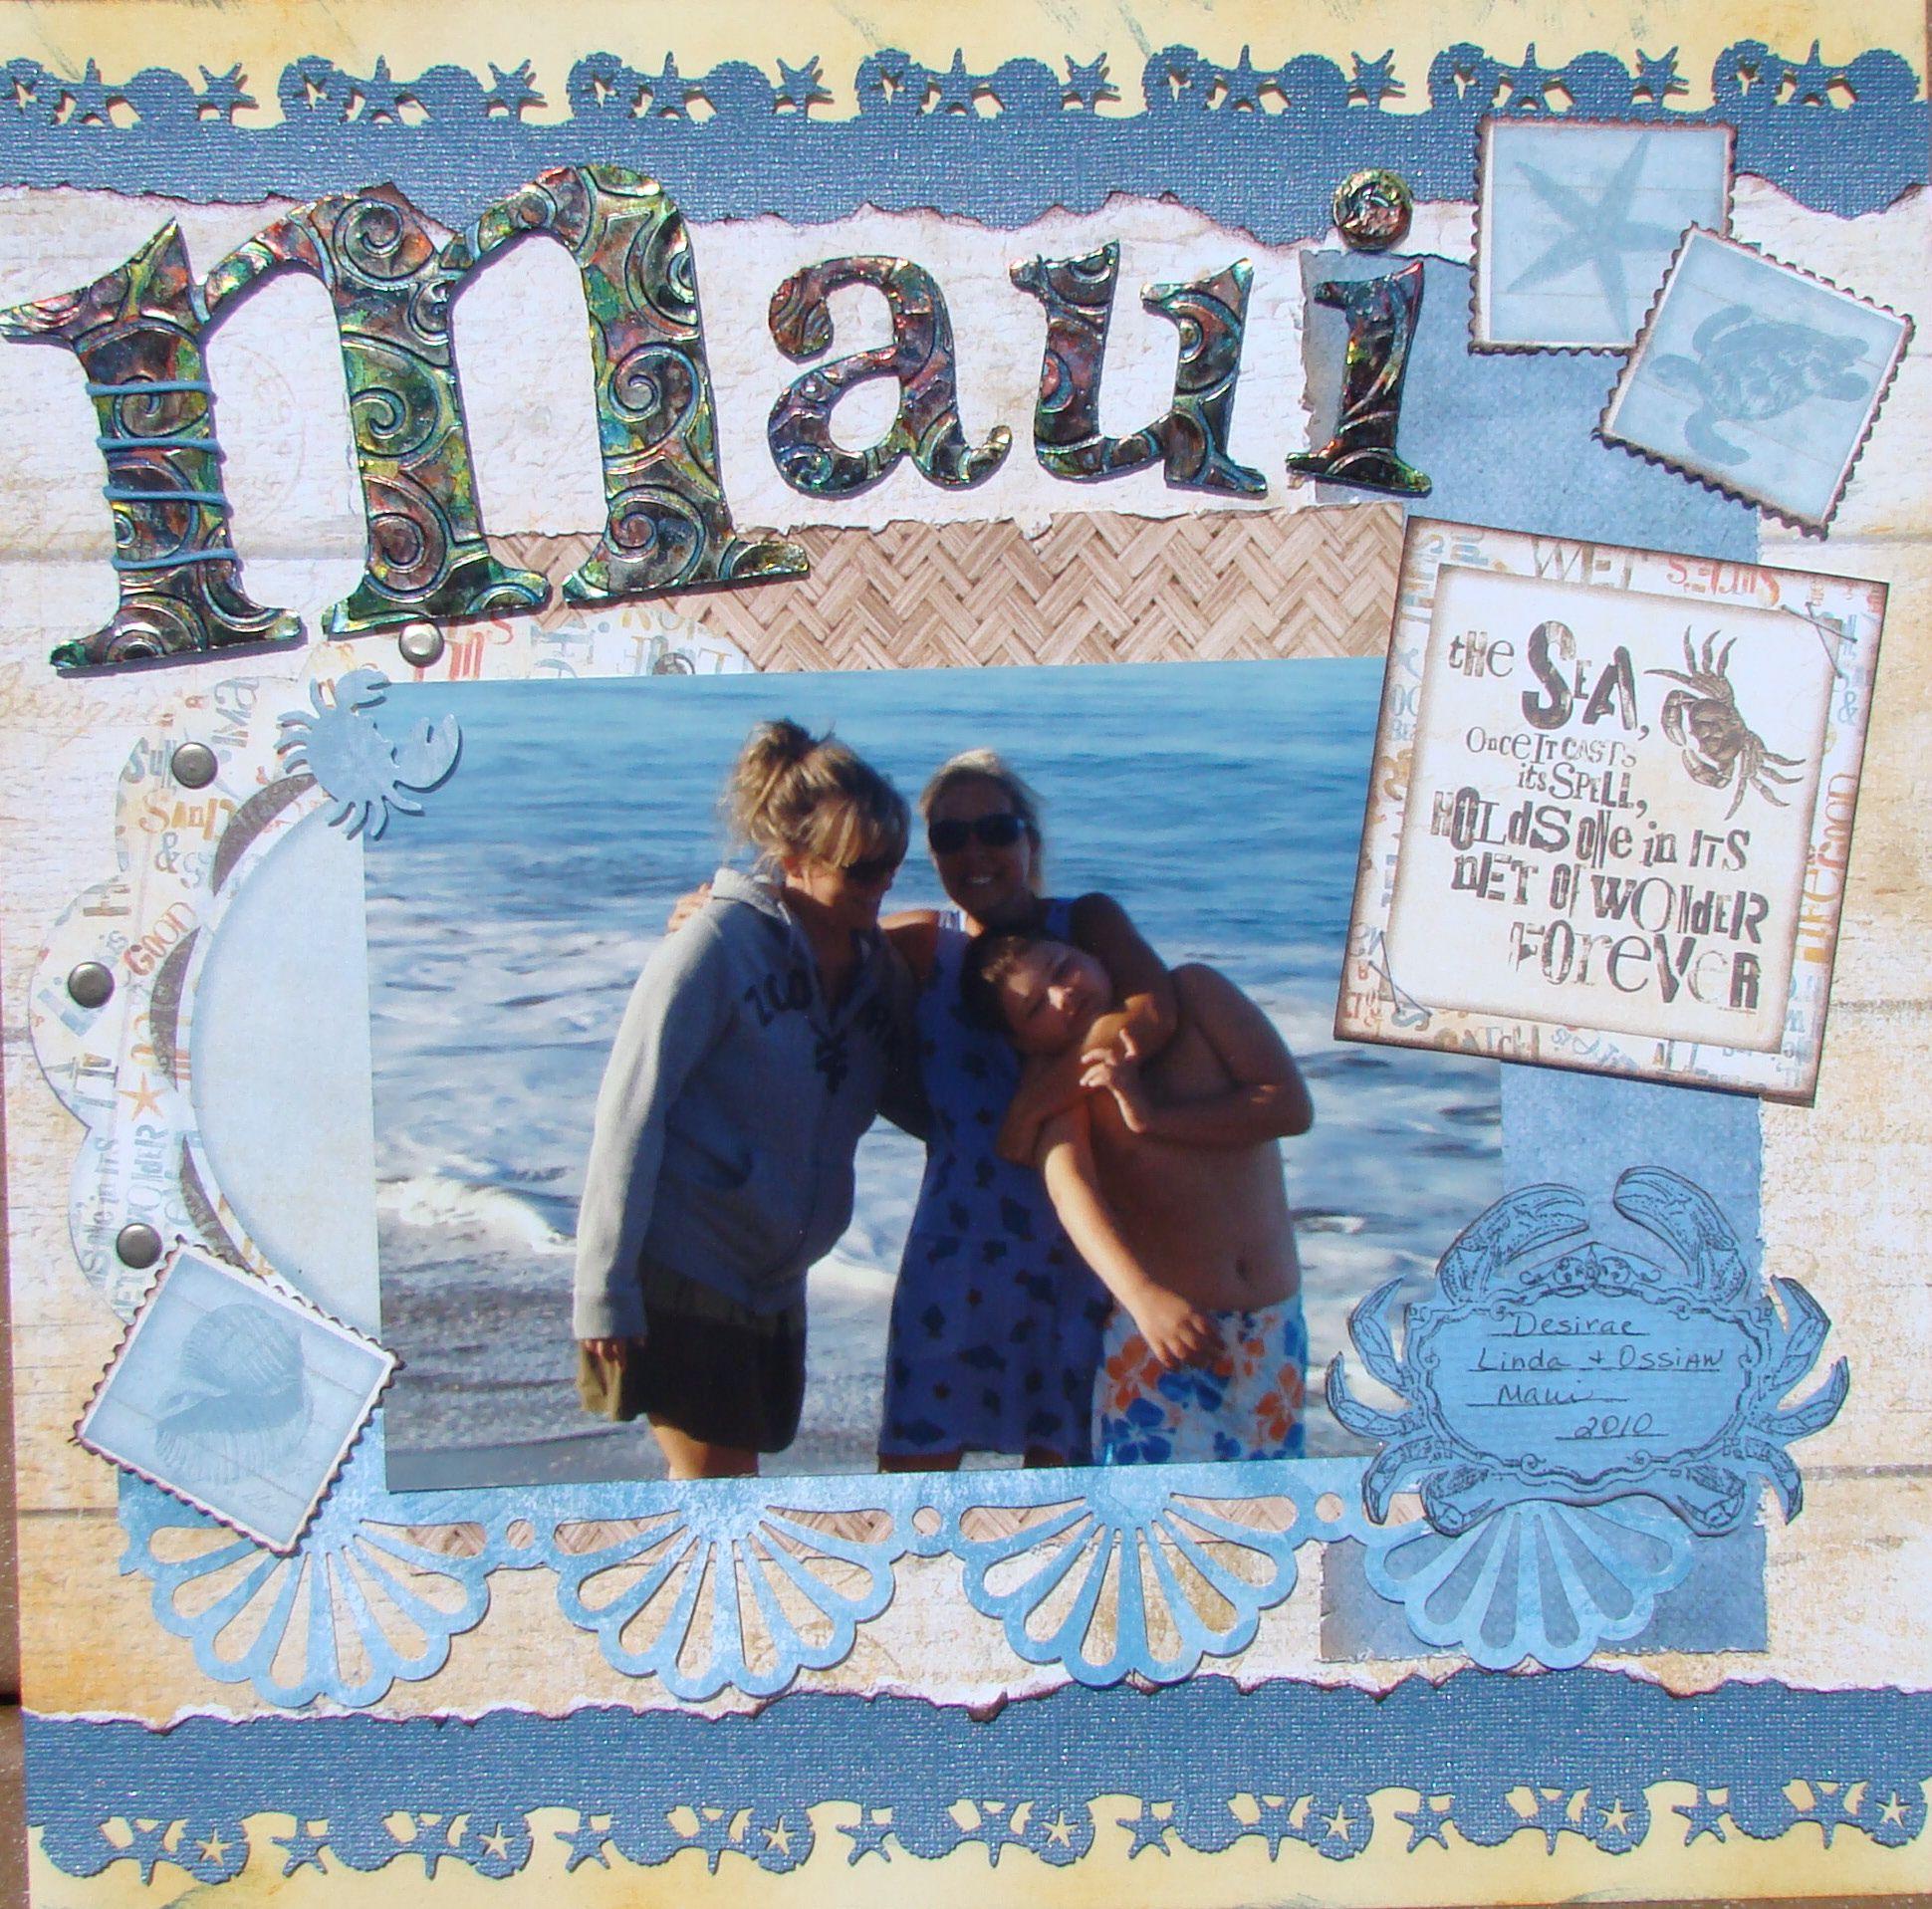 Scrapbook ideas hawaii - Scrapbooking Ideen Scrapbook Layouts Maui Hawaii Vacation Scrapbook Scrapbooks